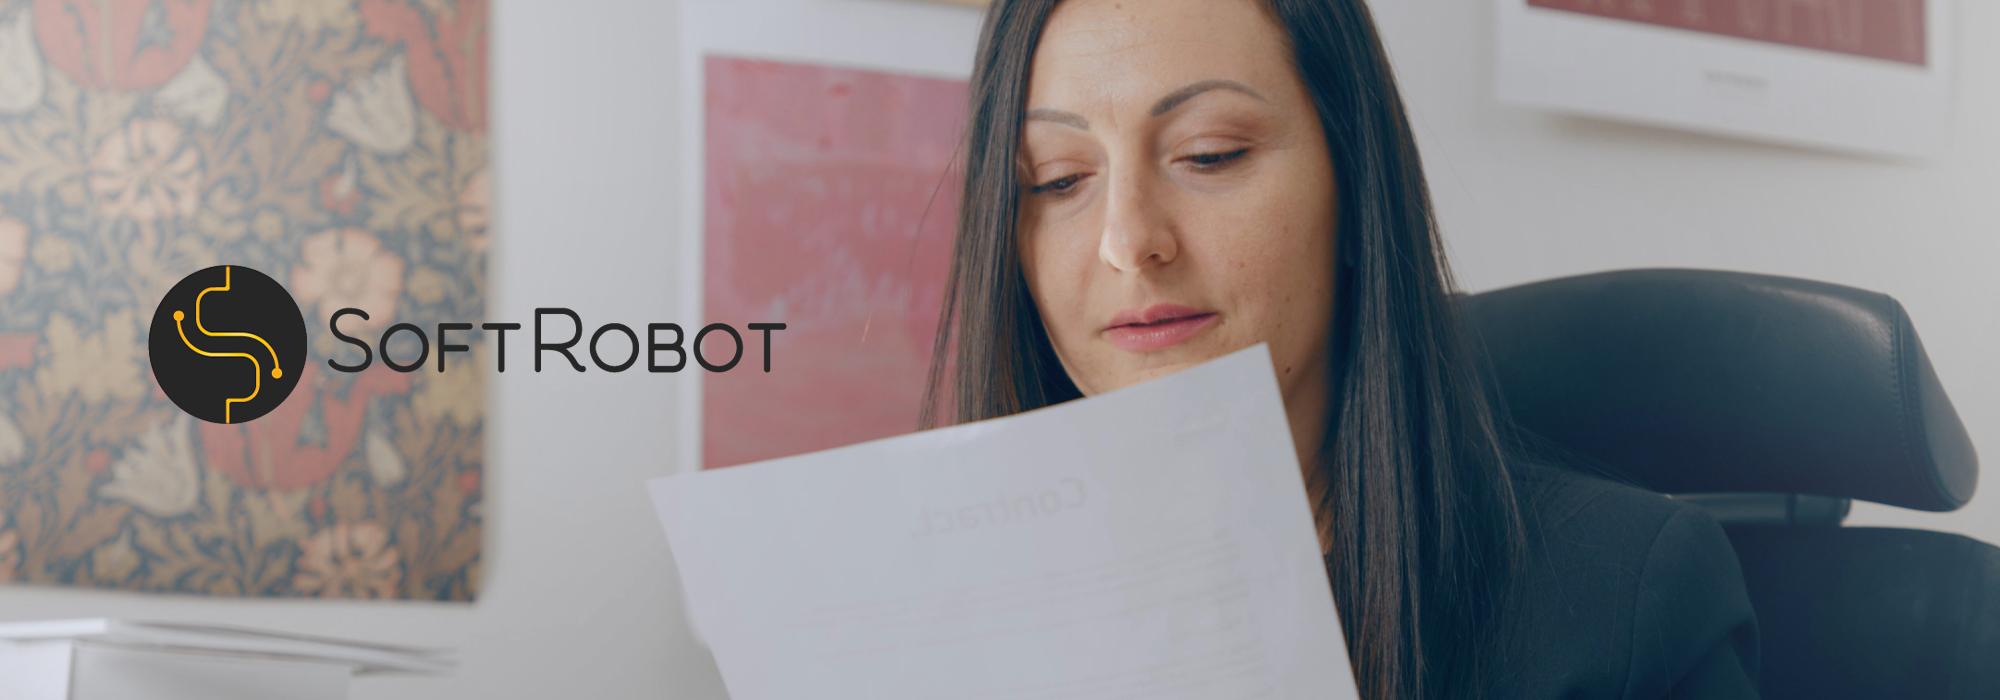 case softrobot kampanj